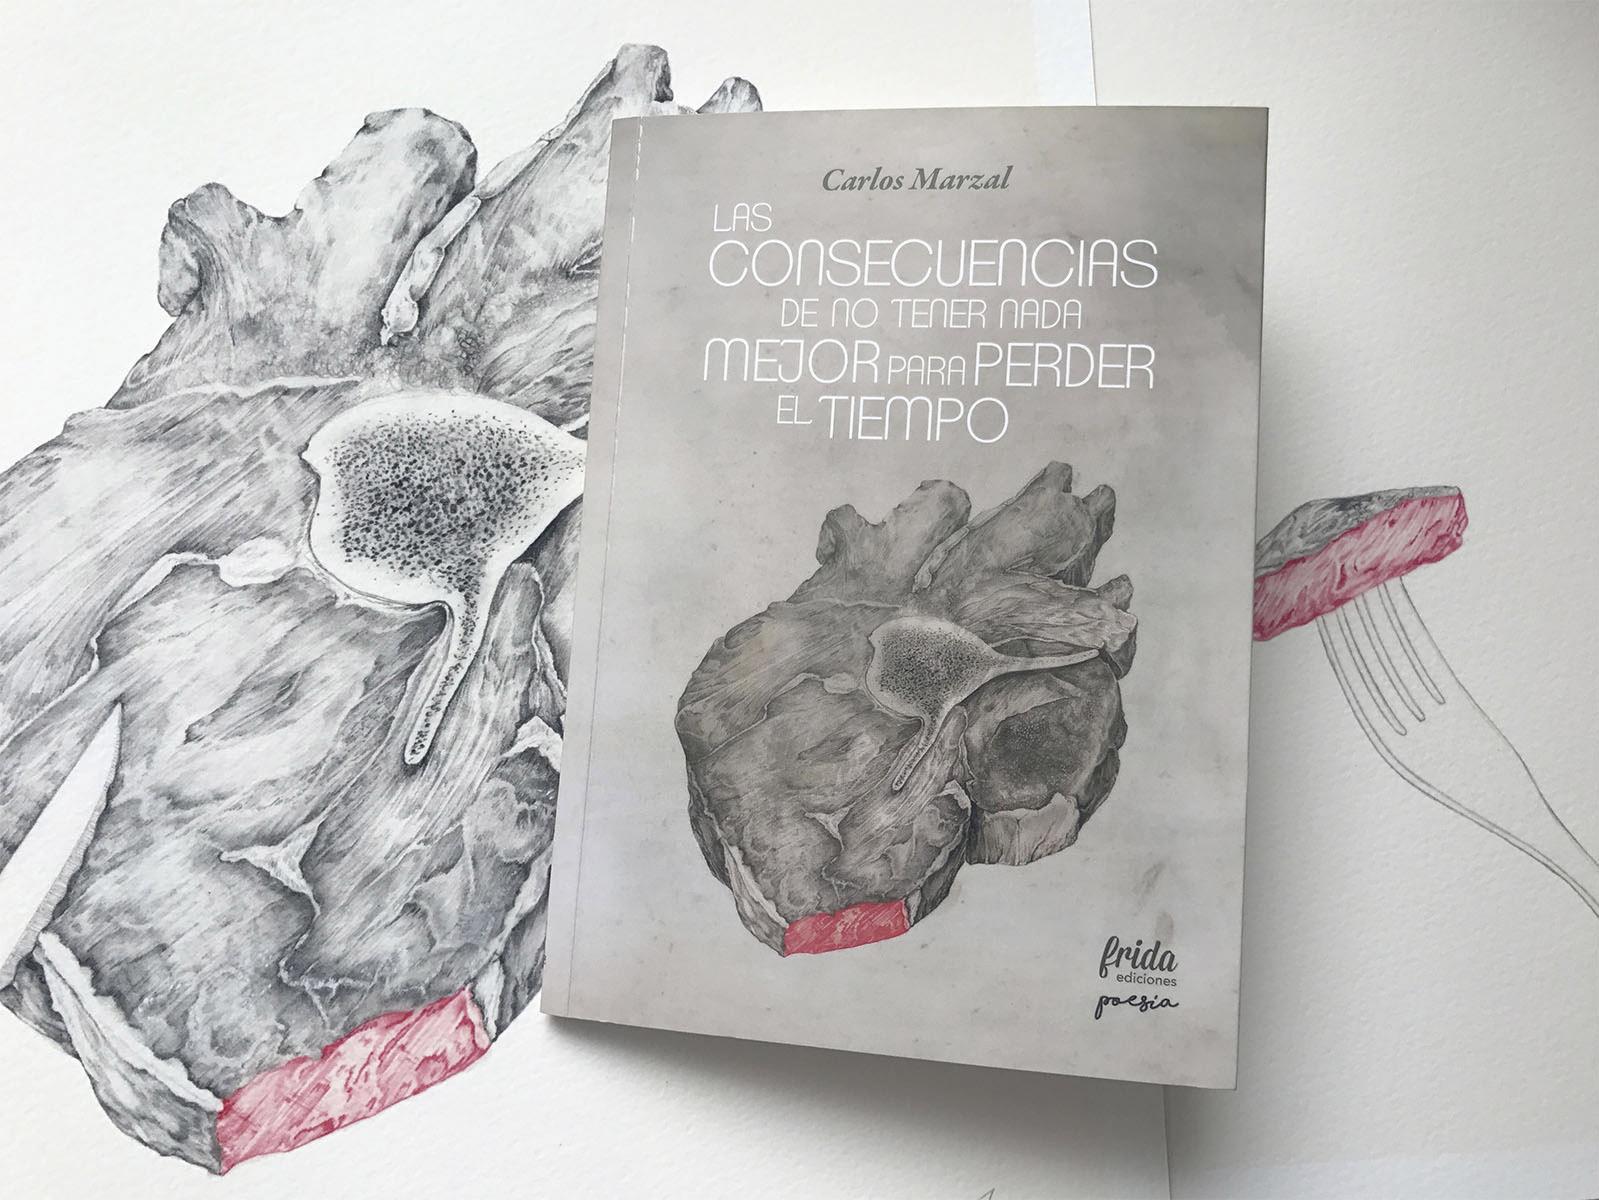 aforismos de Carlos Marzal editado por MueveTuLengua e ilustrador por Giselle Vitali